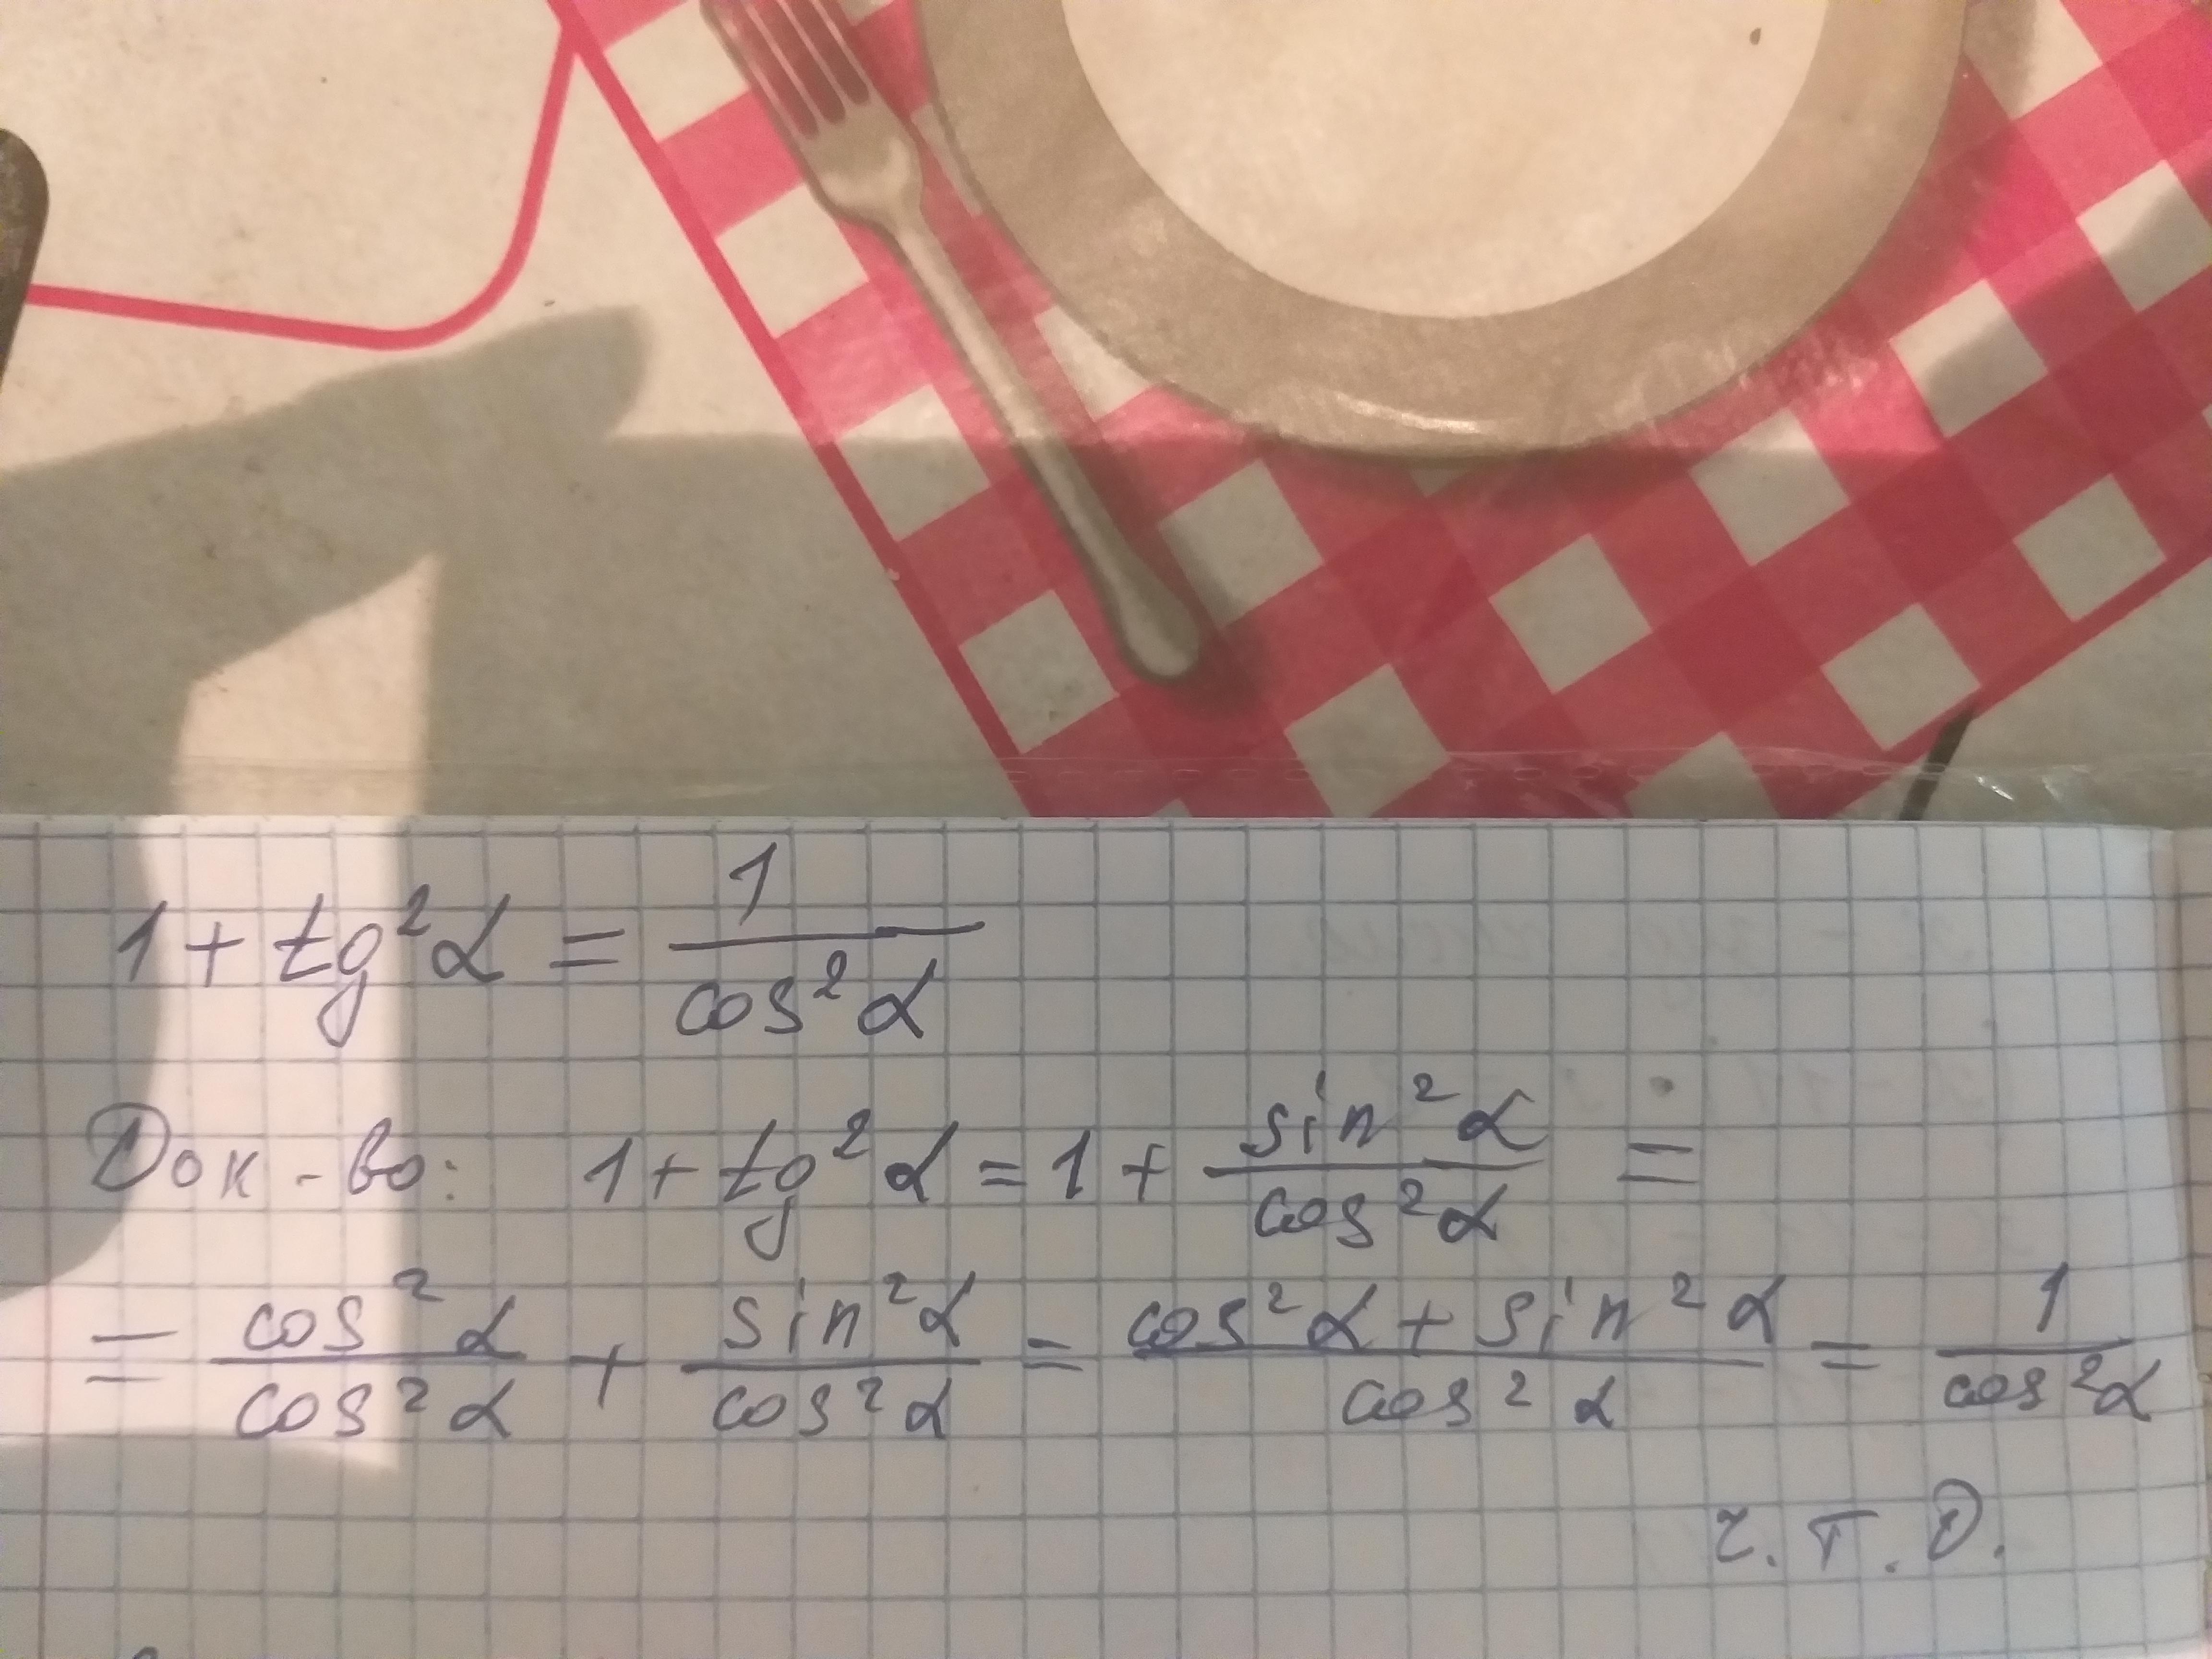 1+tg^2a=1/cos^2a доказать тождество